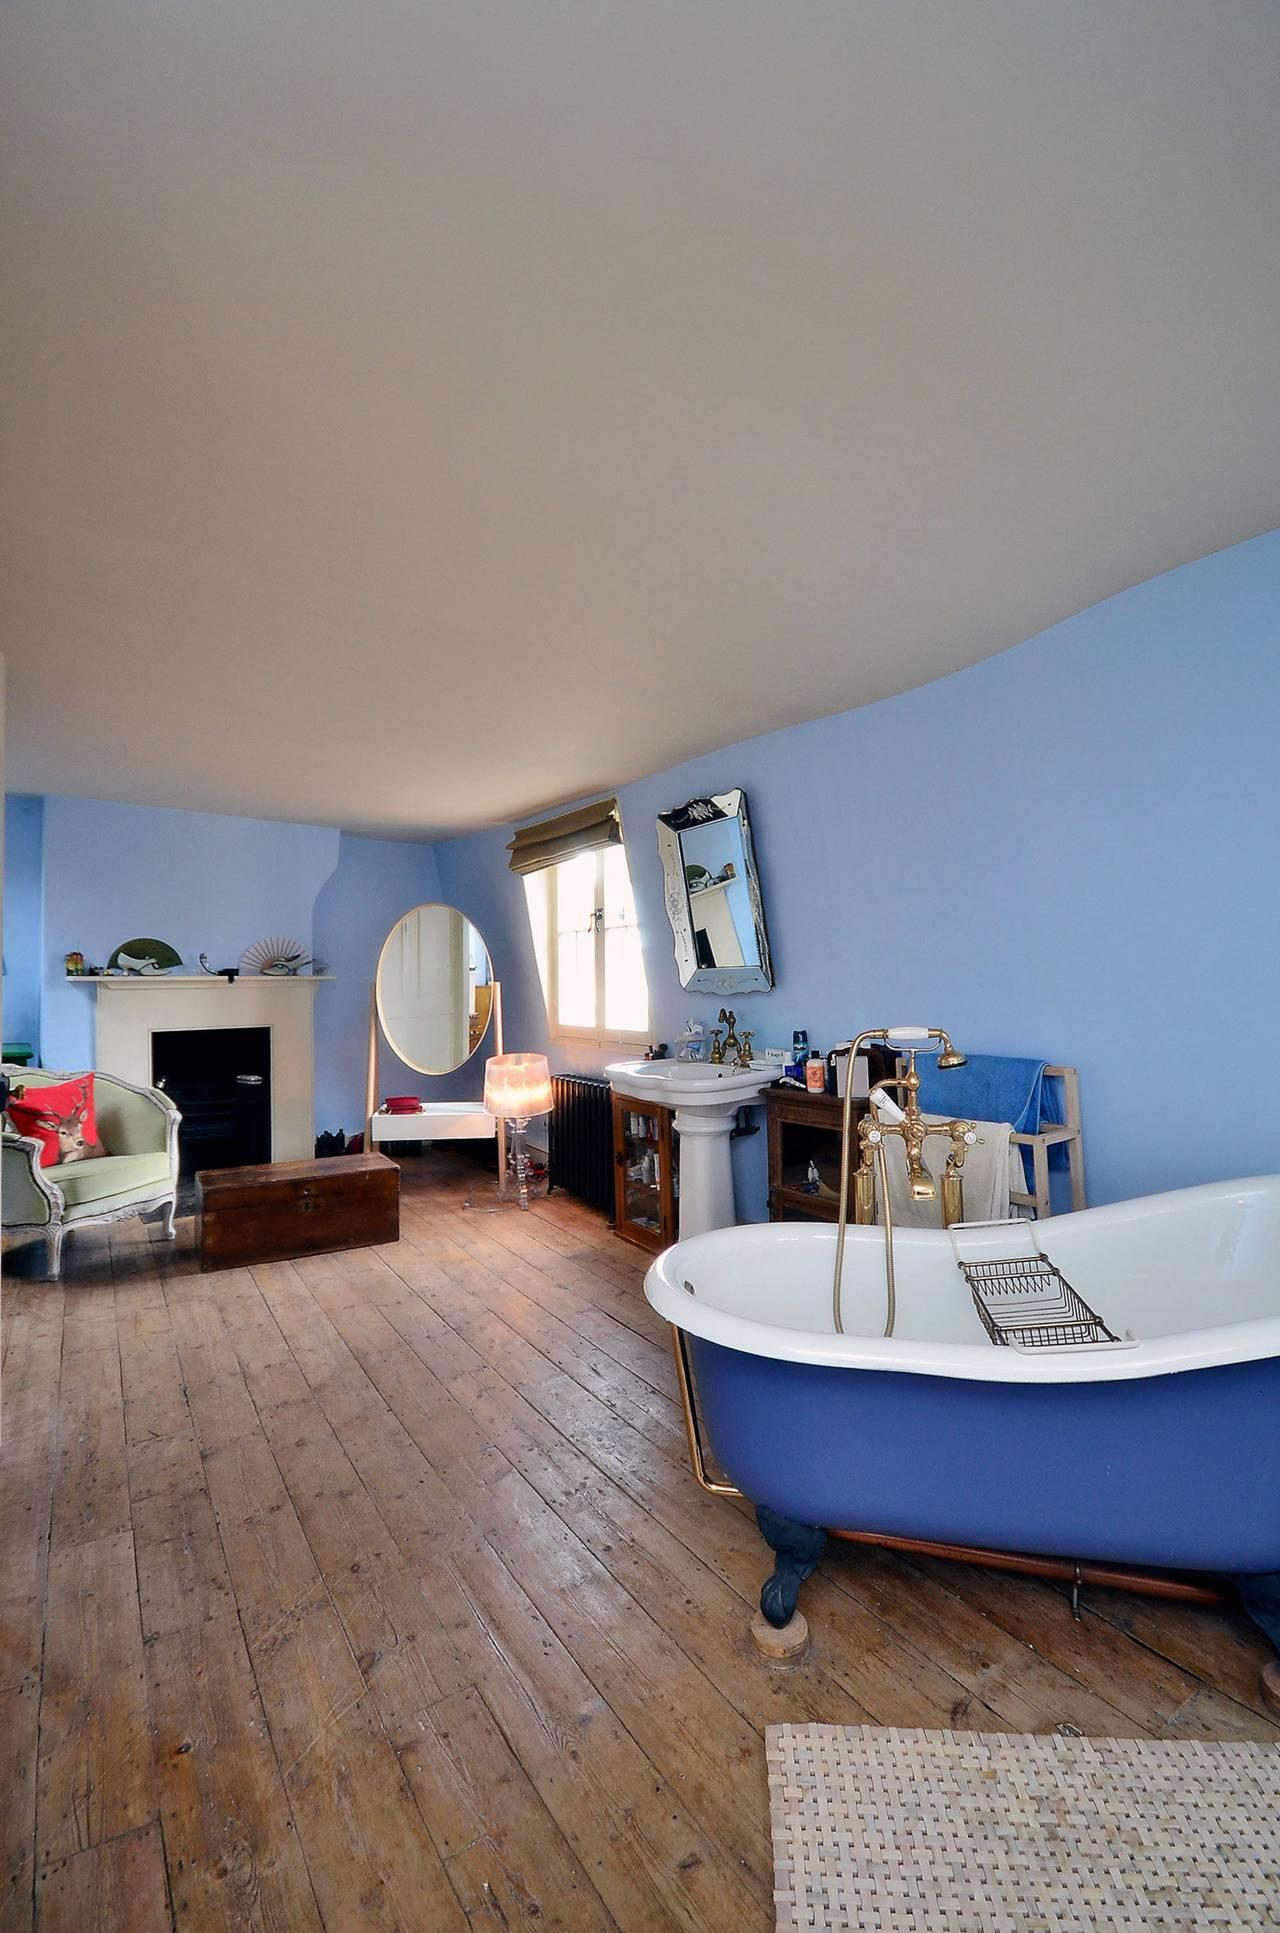 statement-bath, quirky, blue